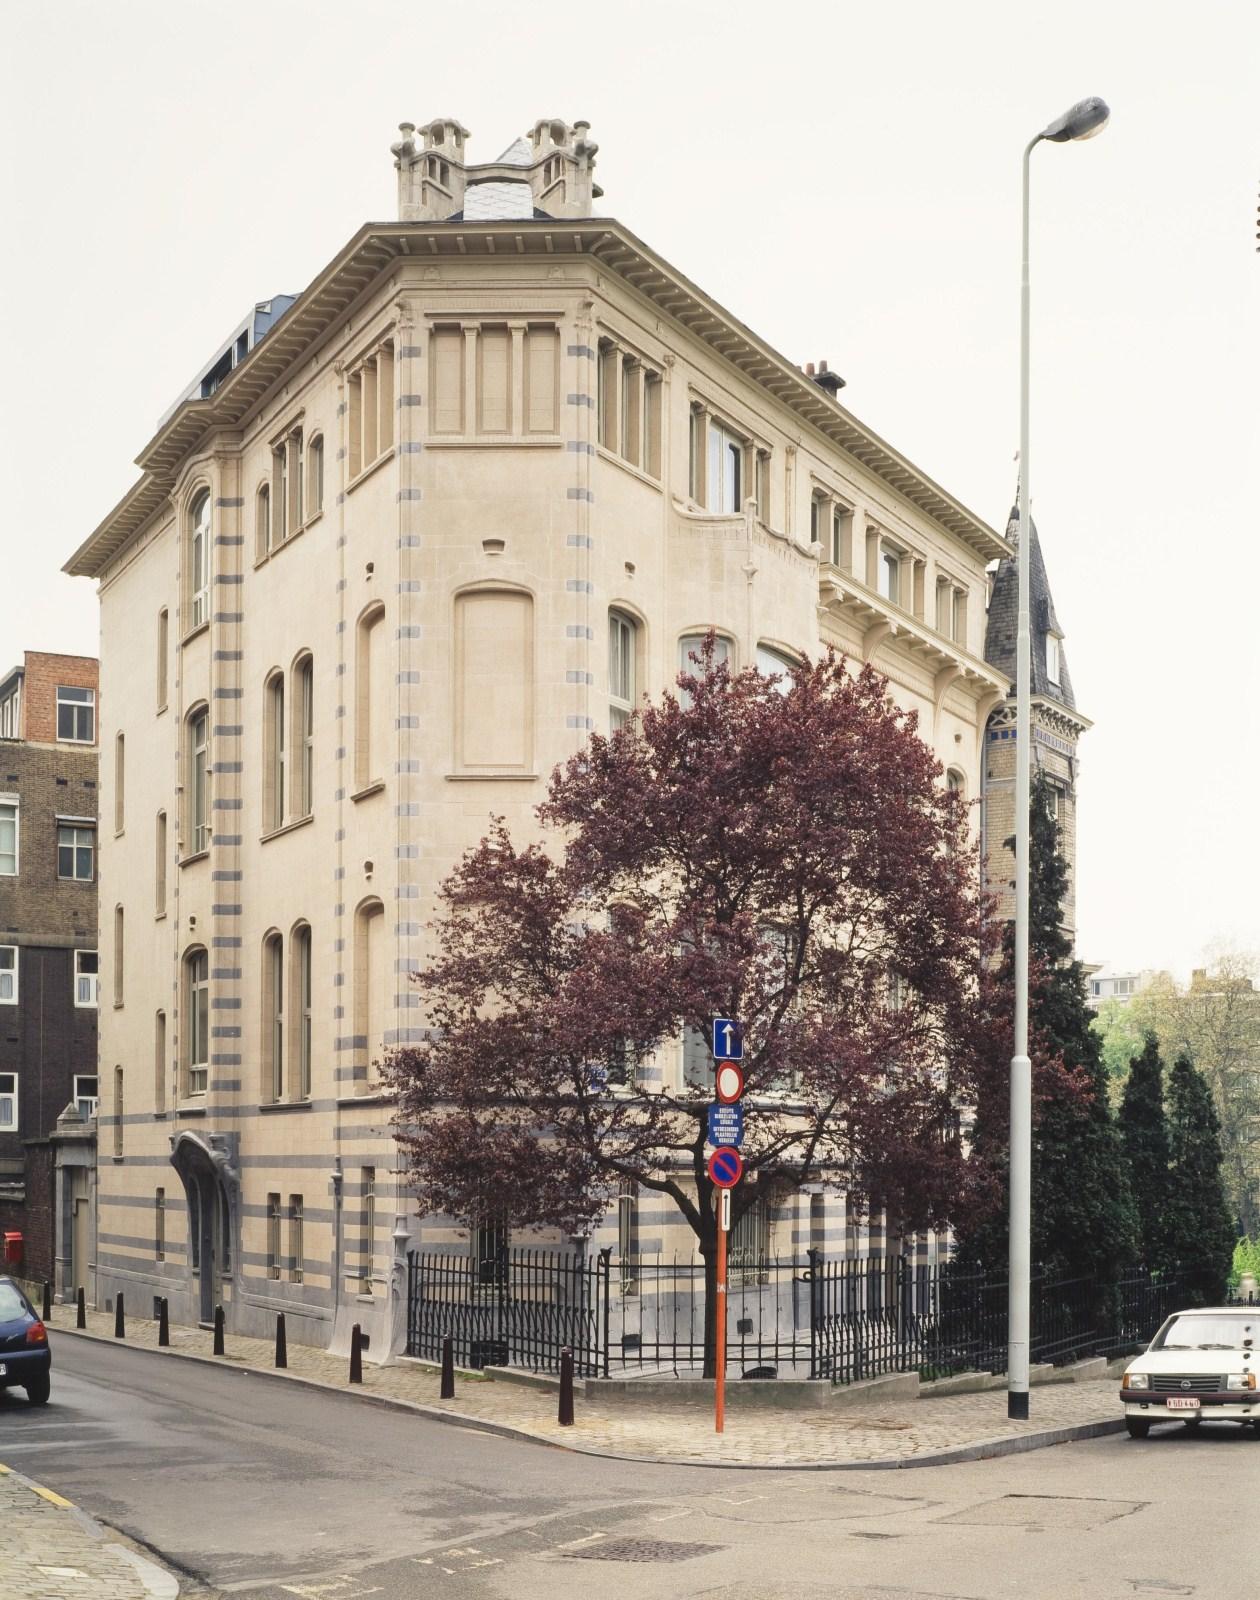 Avenue Palmerston 3 et rue Boduognat 14.© Photo Ch. Bastin & J. Evrard © MRBC